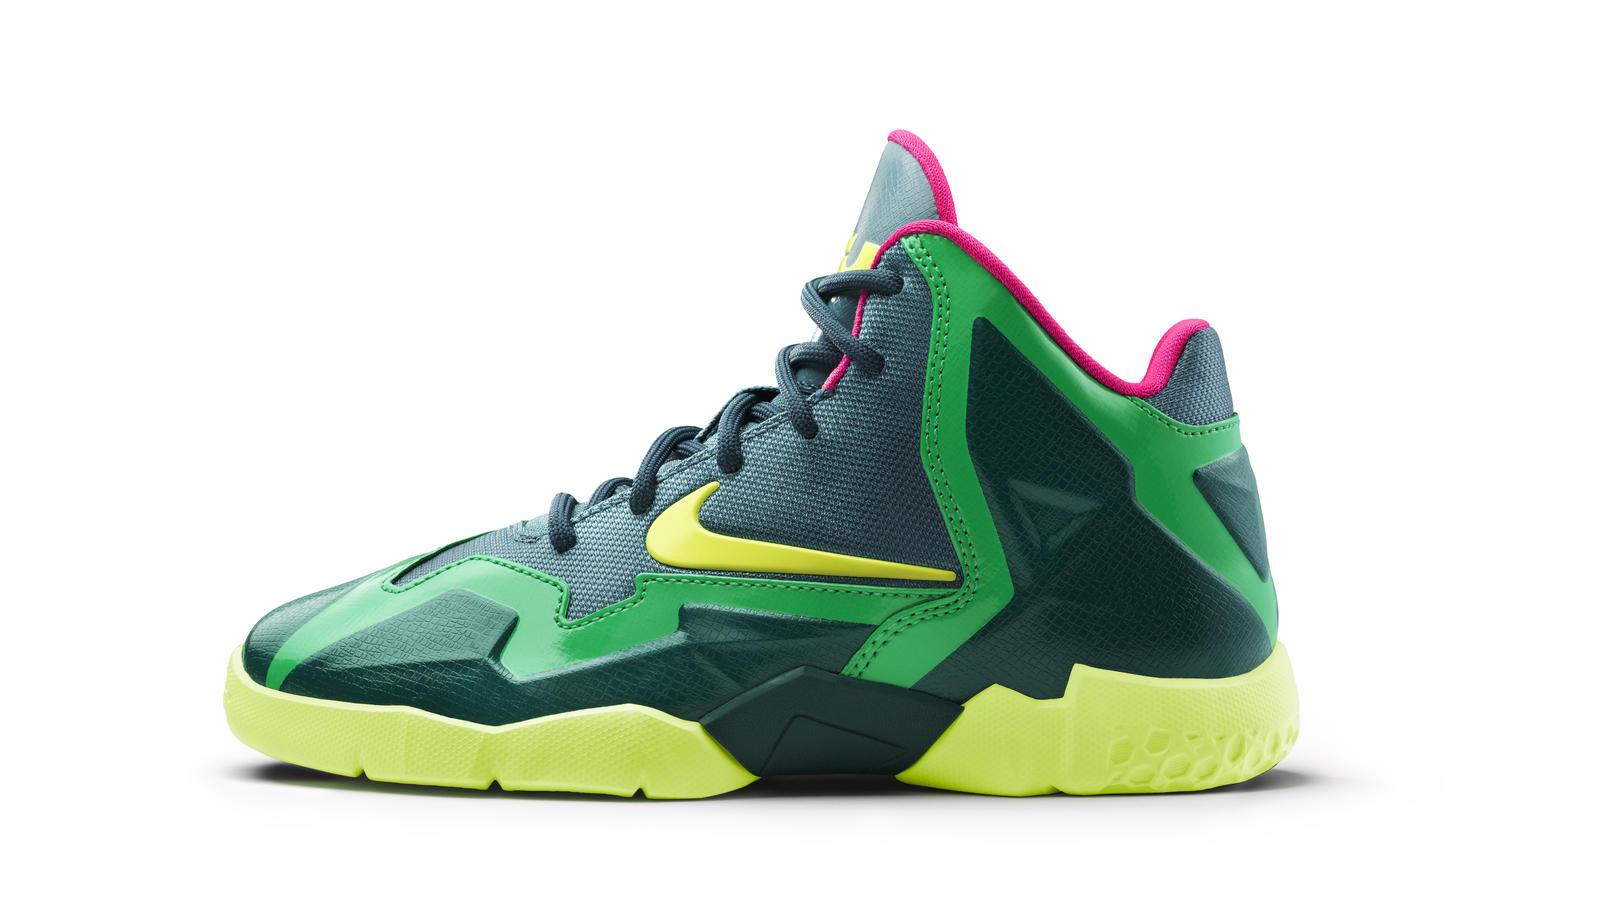 salida Útil a lo largo  LEBRON 11 T-Rex Colorway: Big Inspiration for Smaller Feet - Nike News